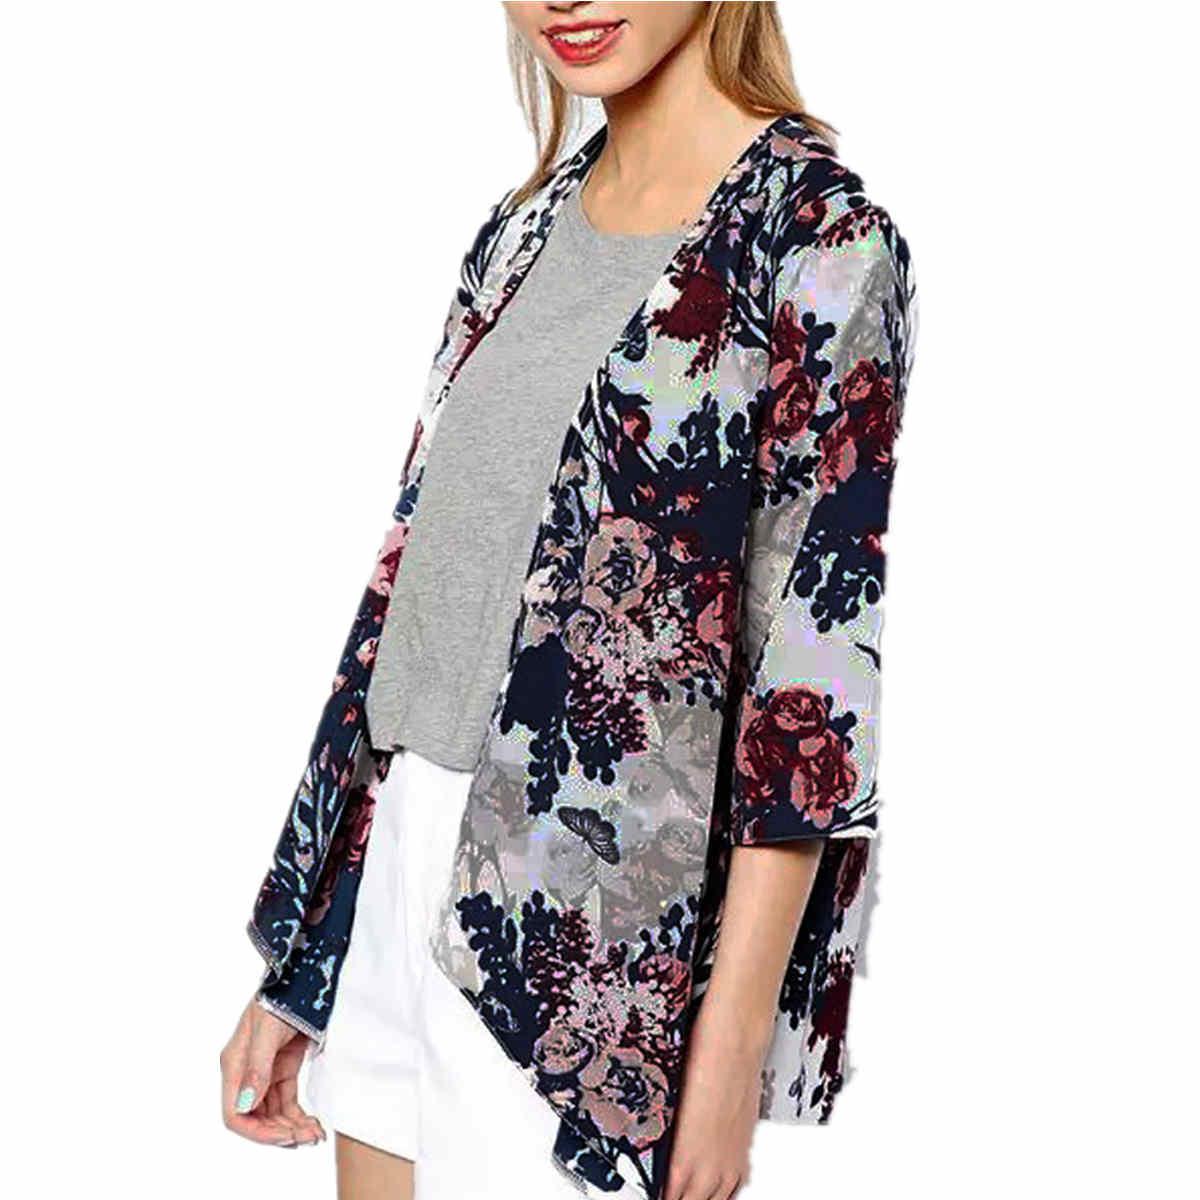 Women Floral Print Boho Half Sleeve Shirt Beach Blouse Cover Up ...